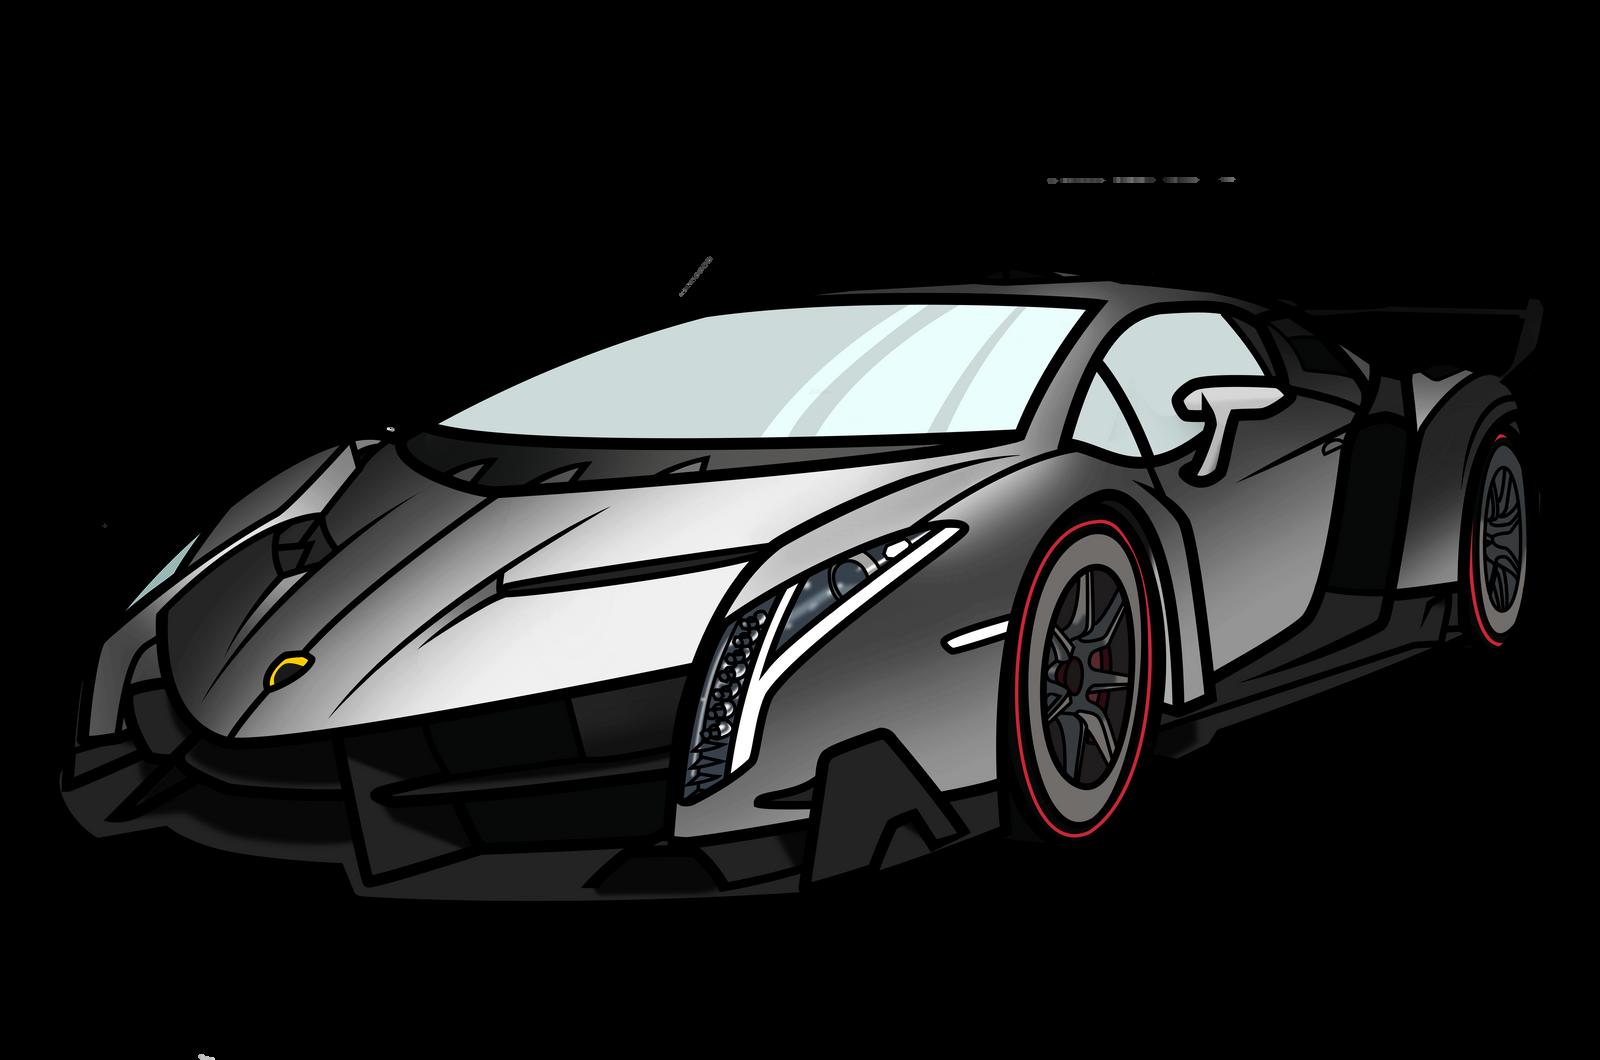 Lamborghini Veneno Vector By Sorelstrasz On Deviantart